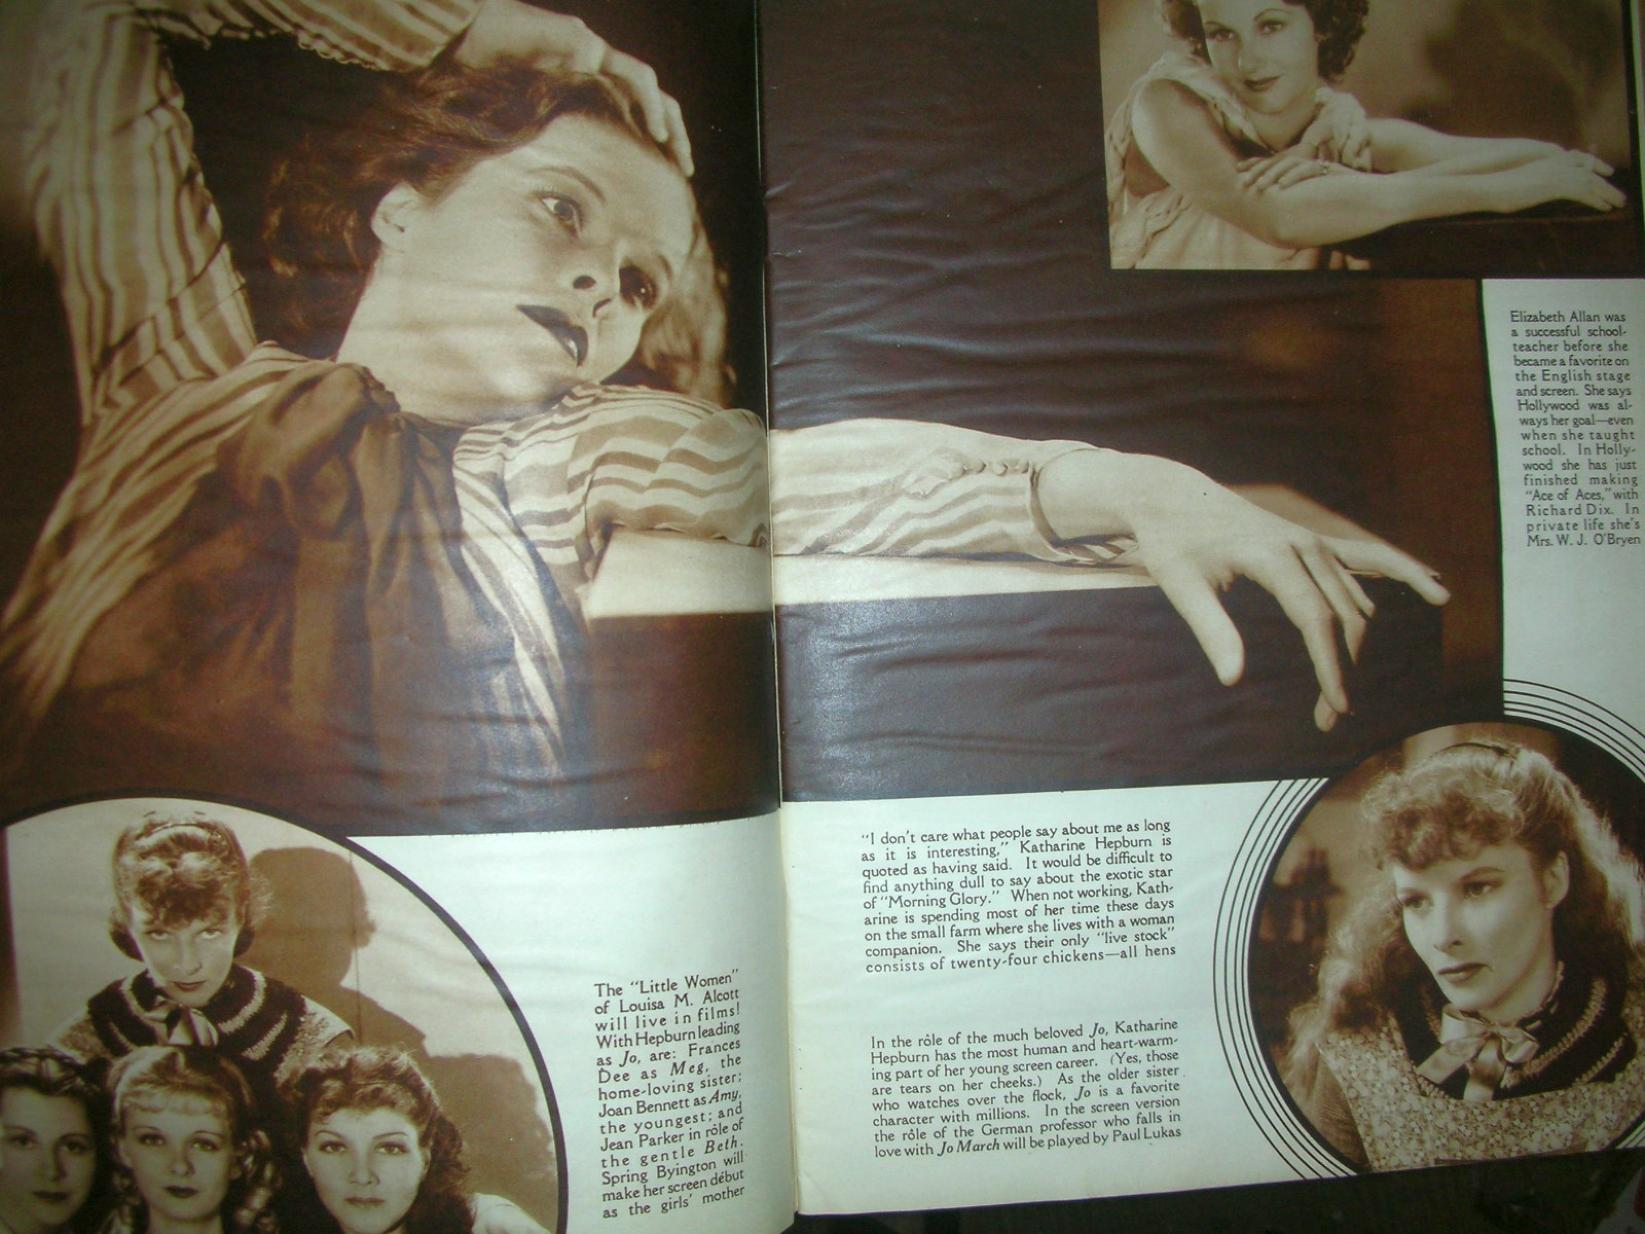 carole lombard shadoplay sept 1933 katharine hepburn large